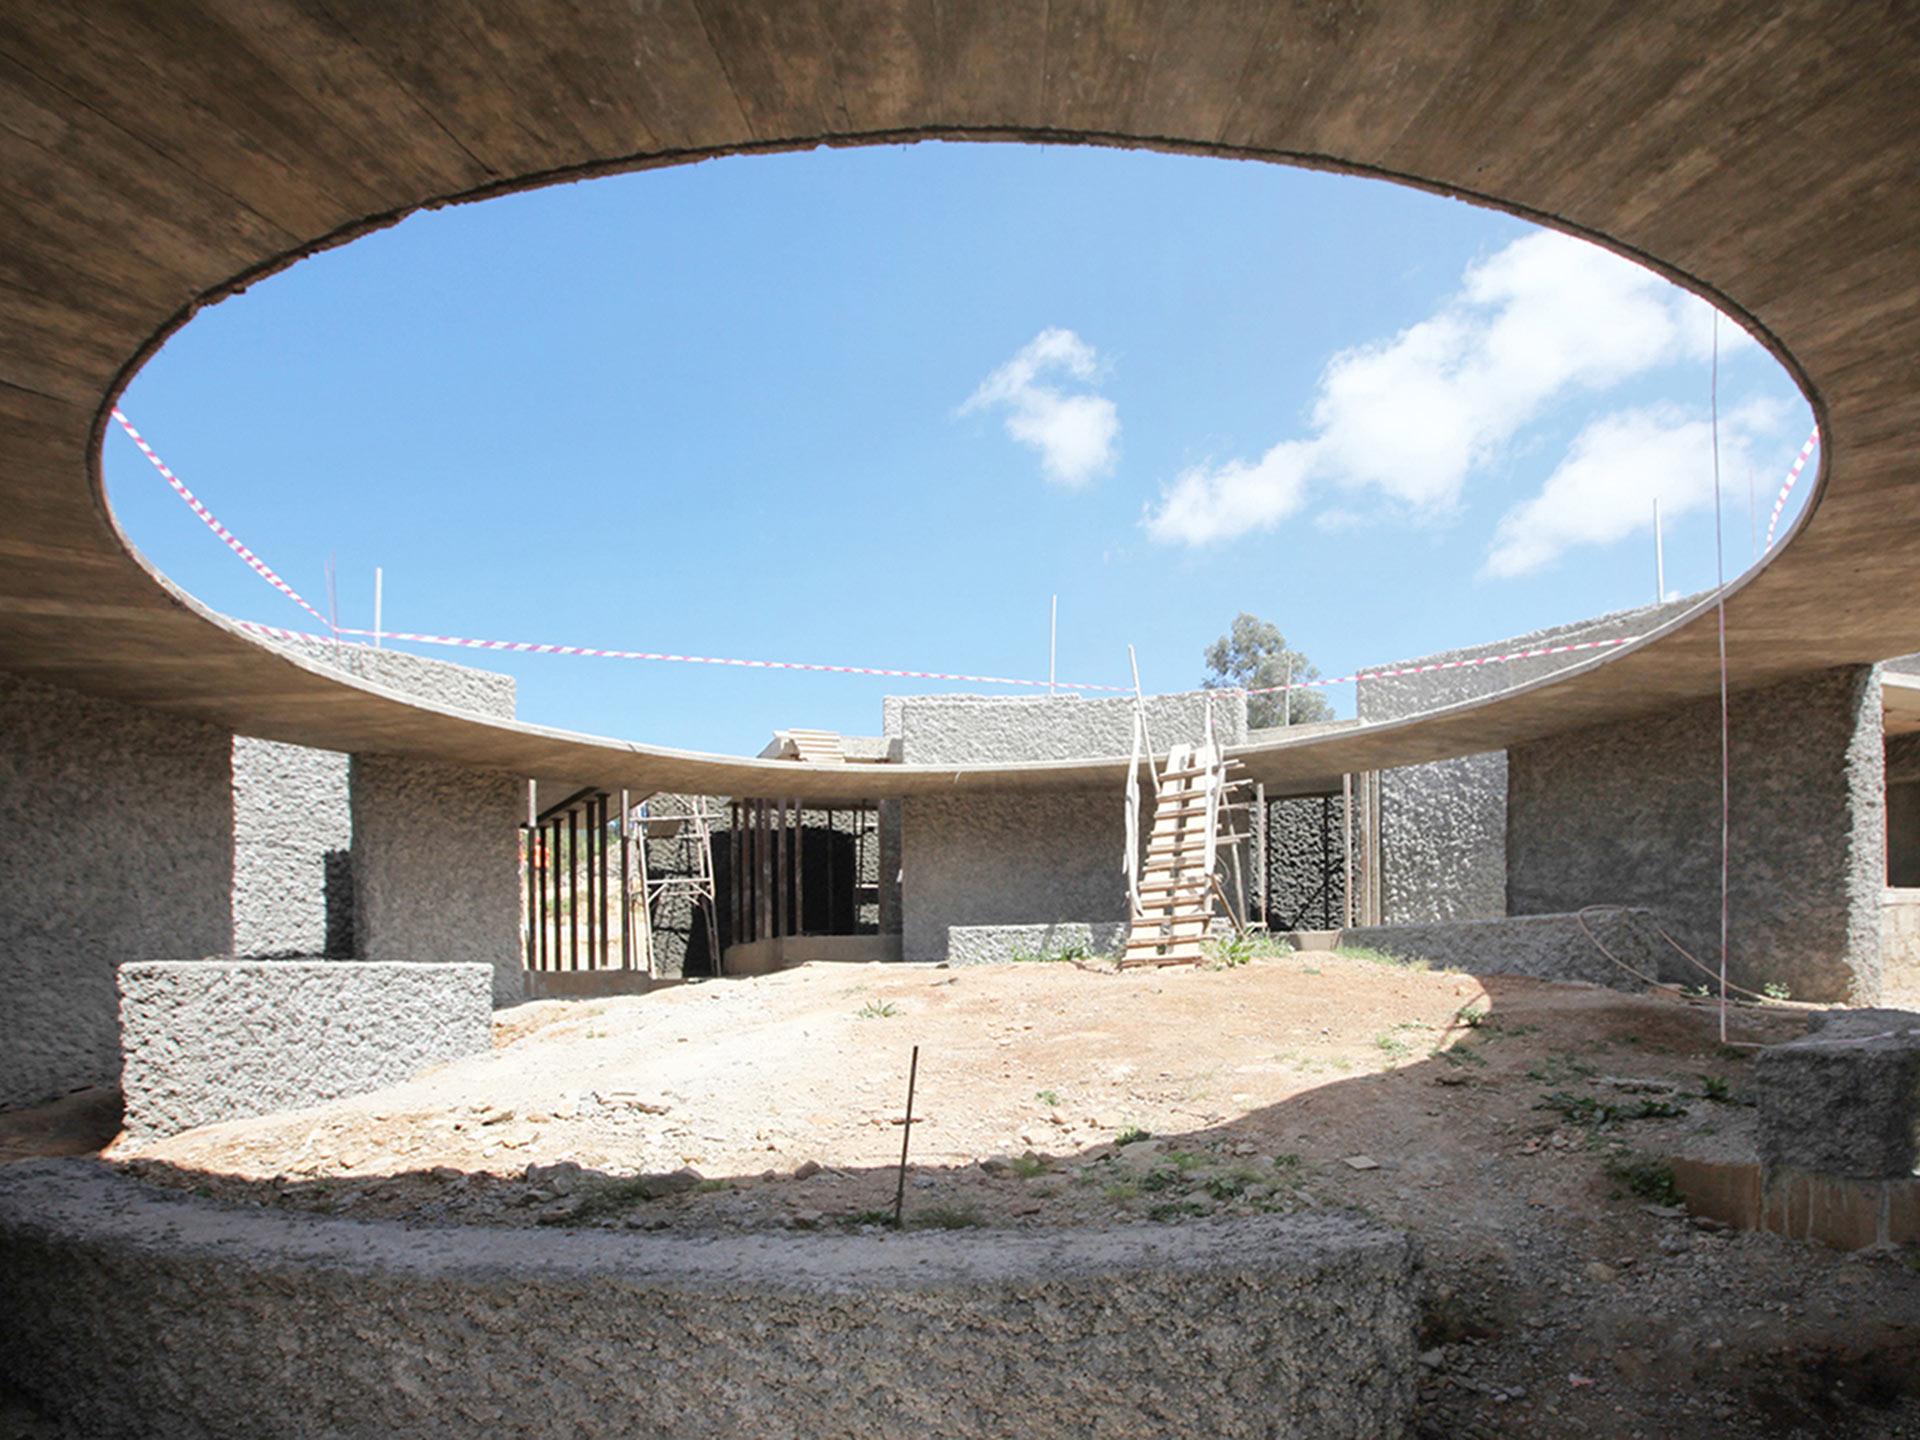 Meles Zenawi Memorial Park